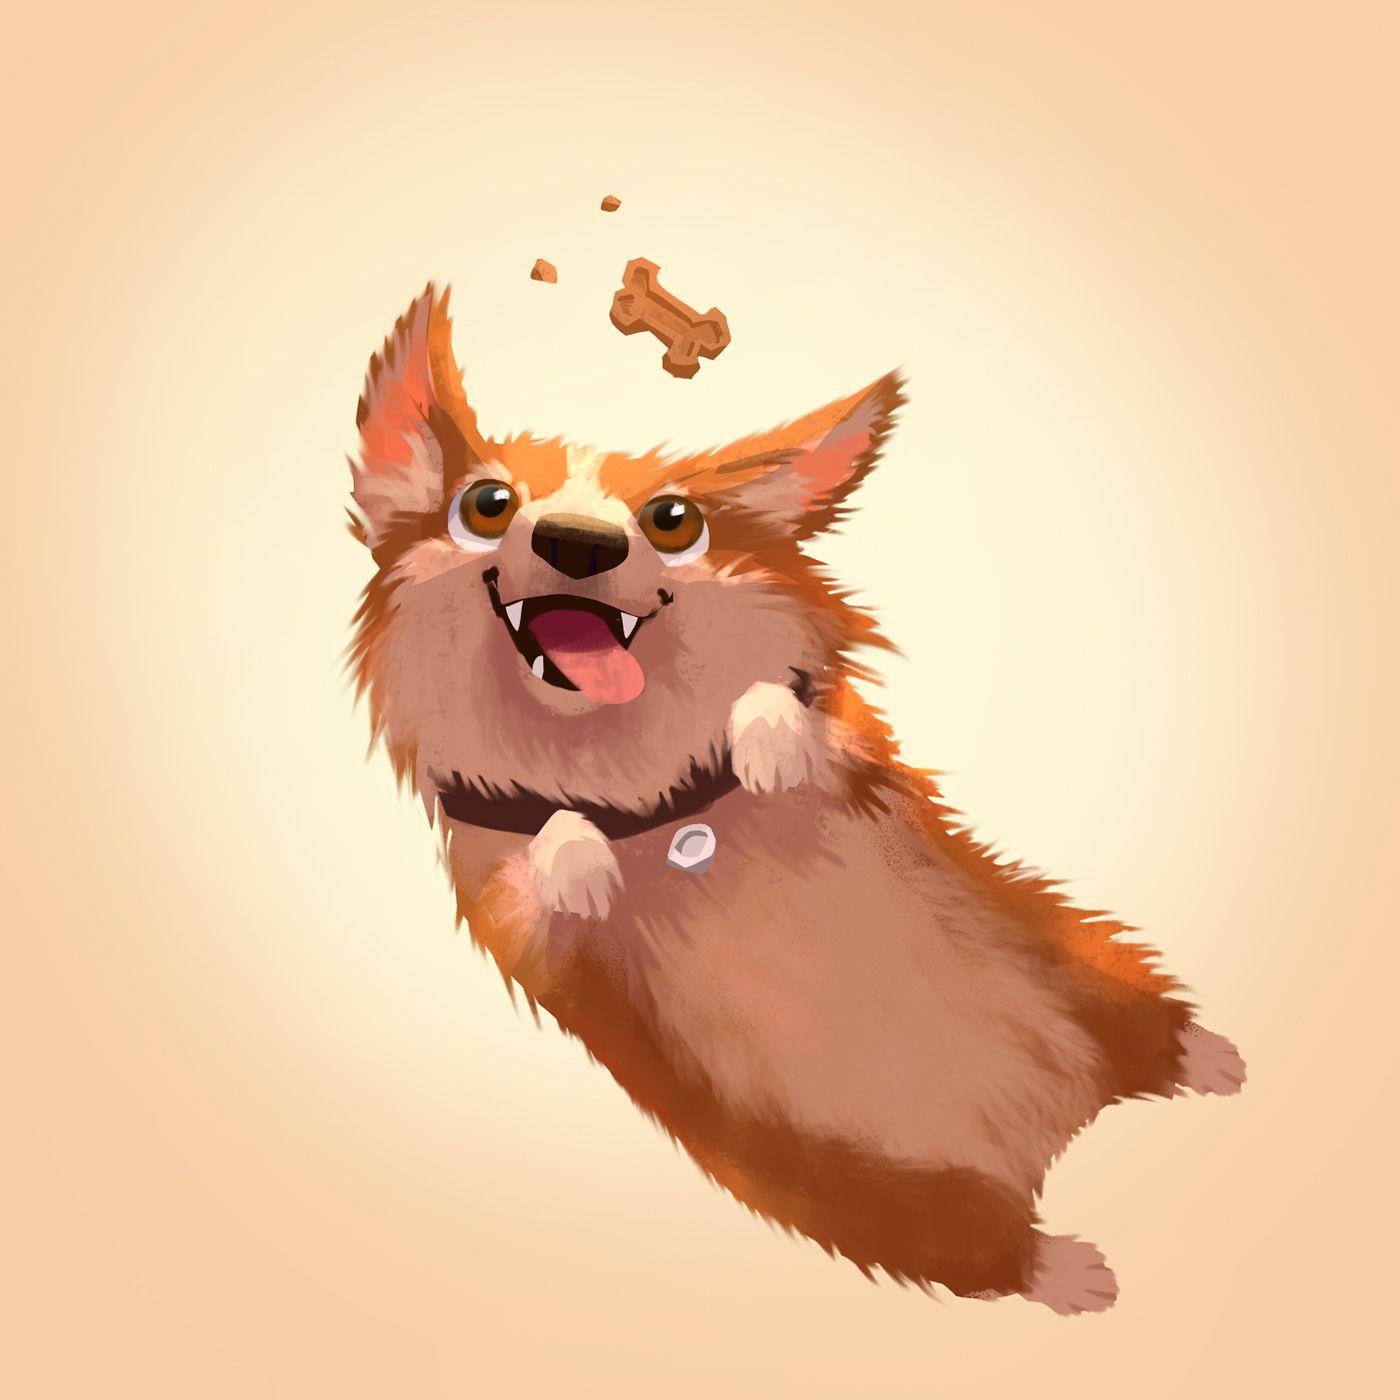 ef355382d2e565 Mochi the Corgi on Behance   character design   Corgi drawing, Dog ...